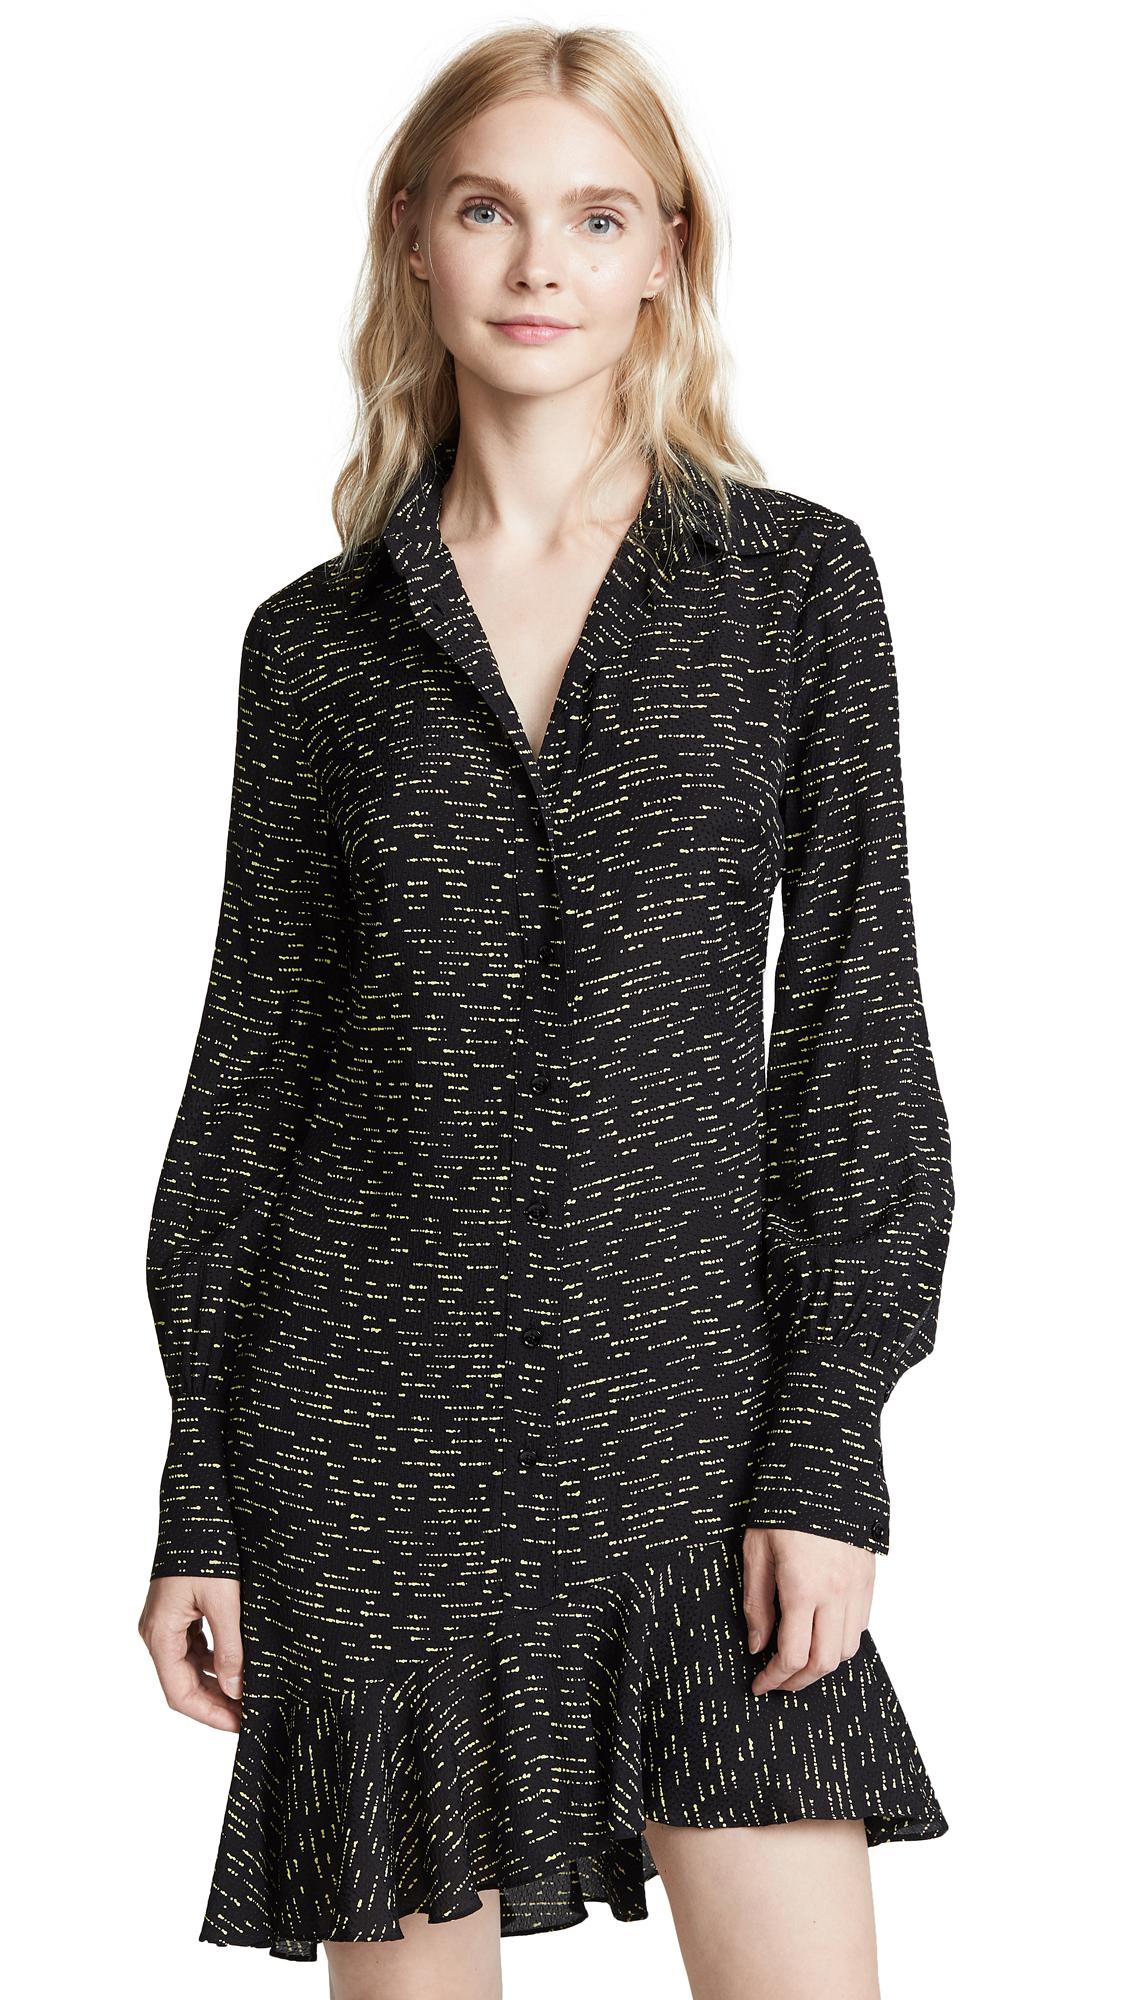 Derek Lam 10 Crosby Shirtdress With Asymmetrical Hem In Black